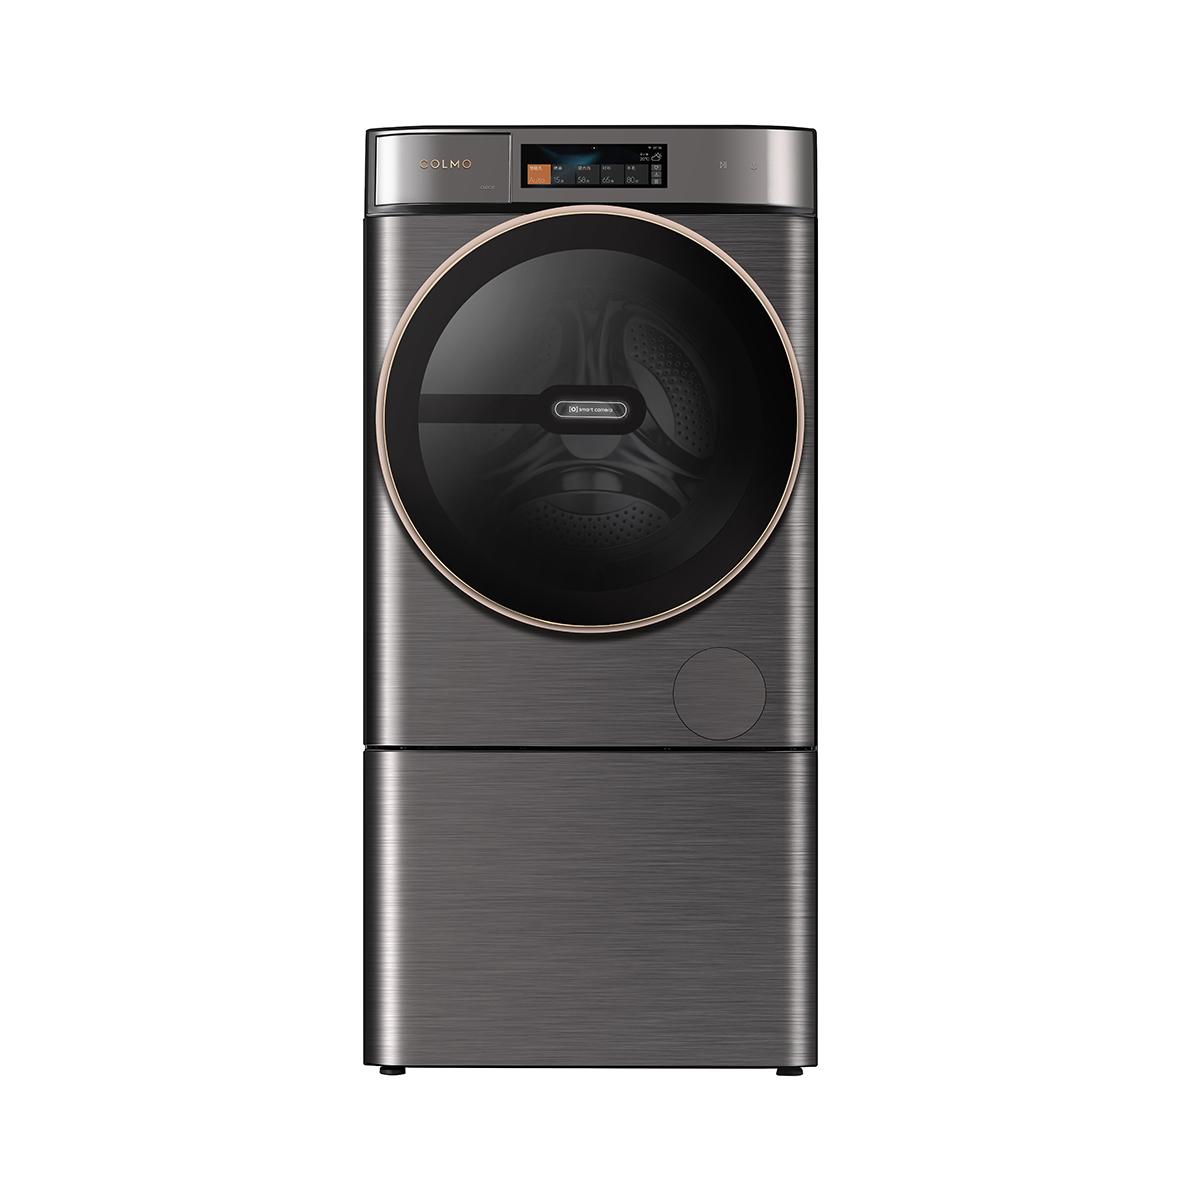 COLMO CLDC12洗衣机 说明书.pdf